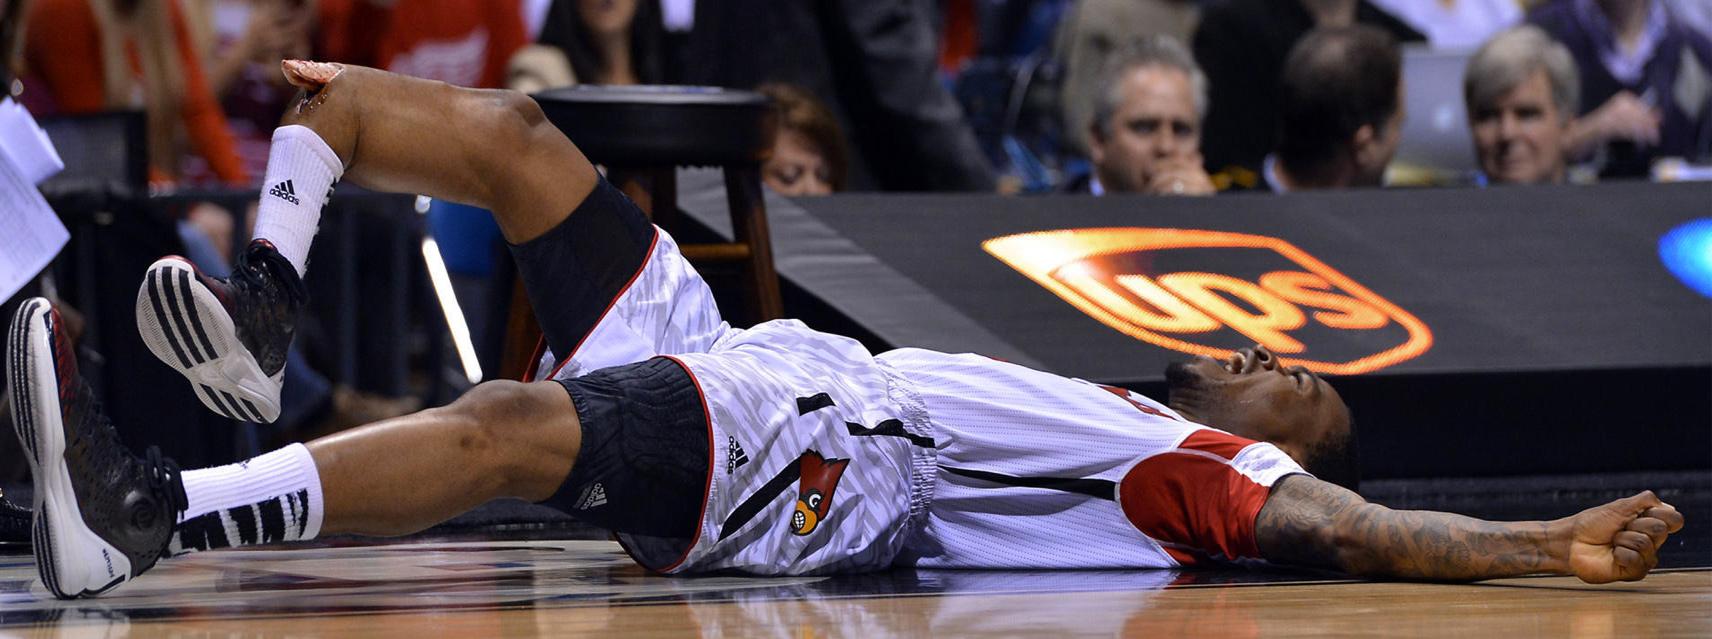 Kevin Ware Suffers Broken Leg During Louisville Vs Duke